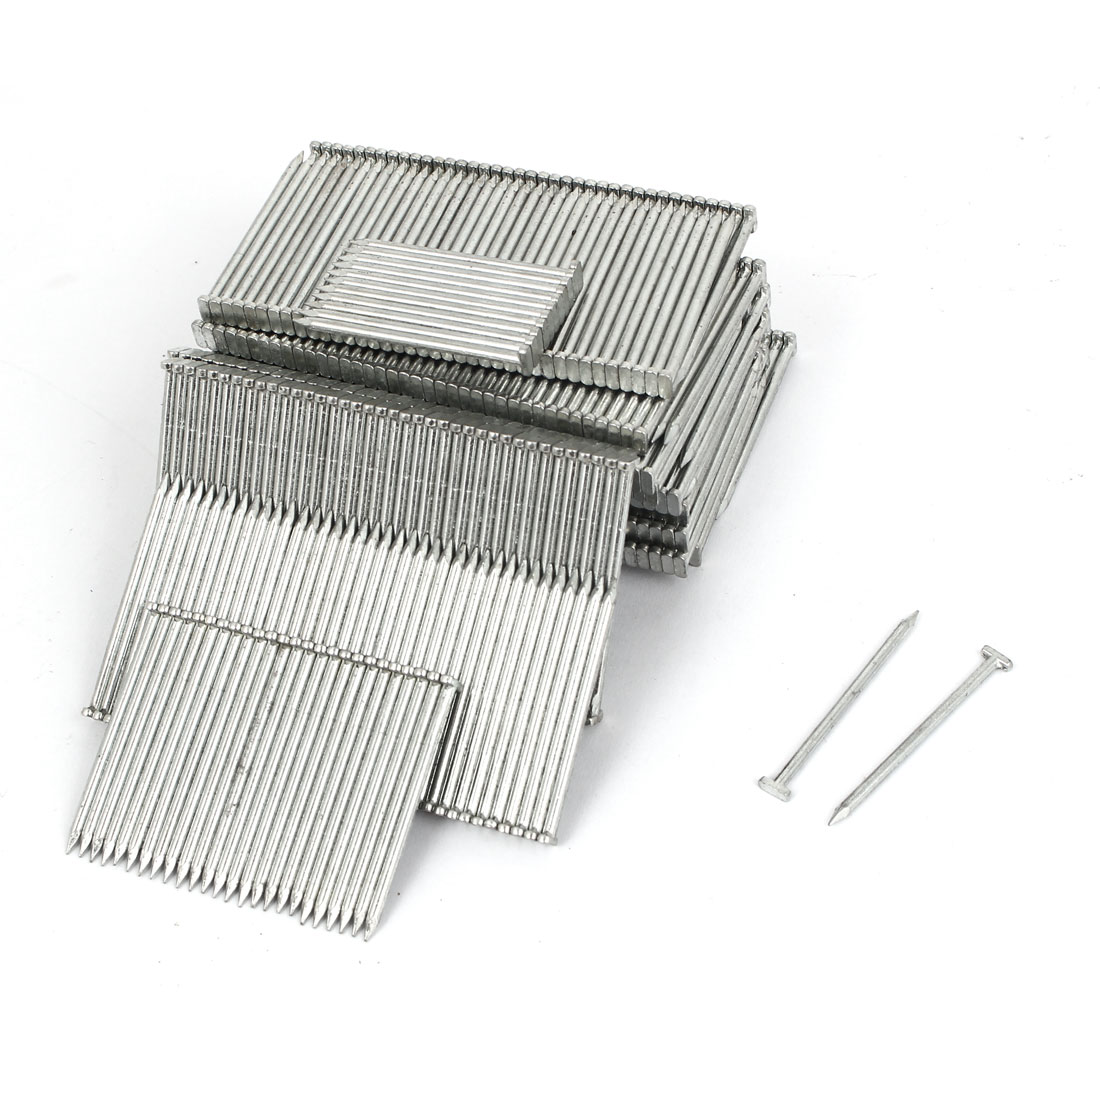 Decorative Steel T45 Brad Nails Silver Tone 41mm Length 874PCS